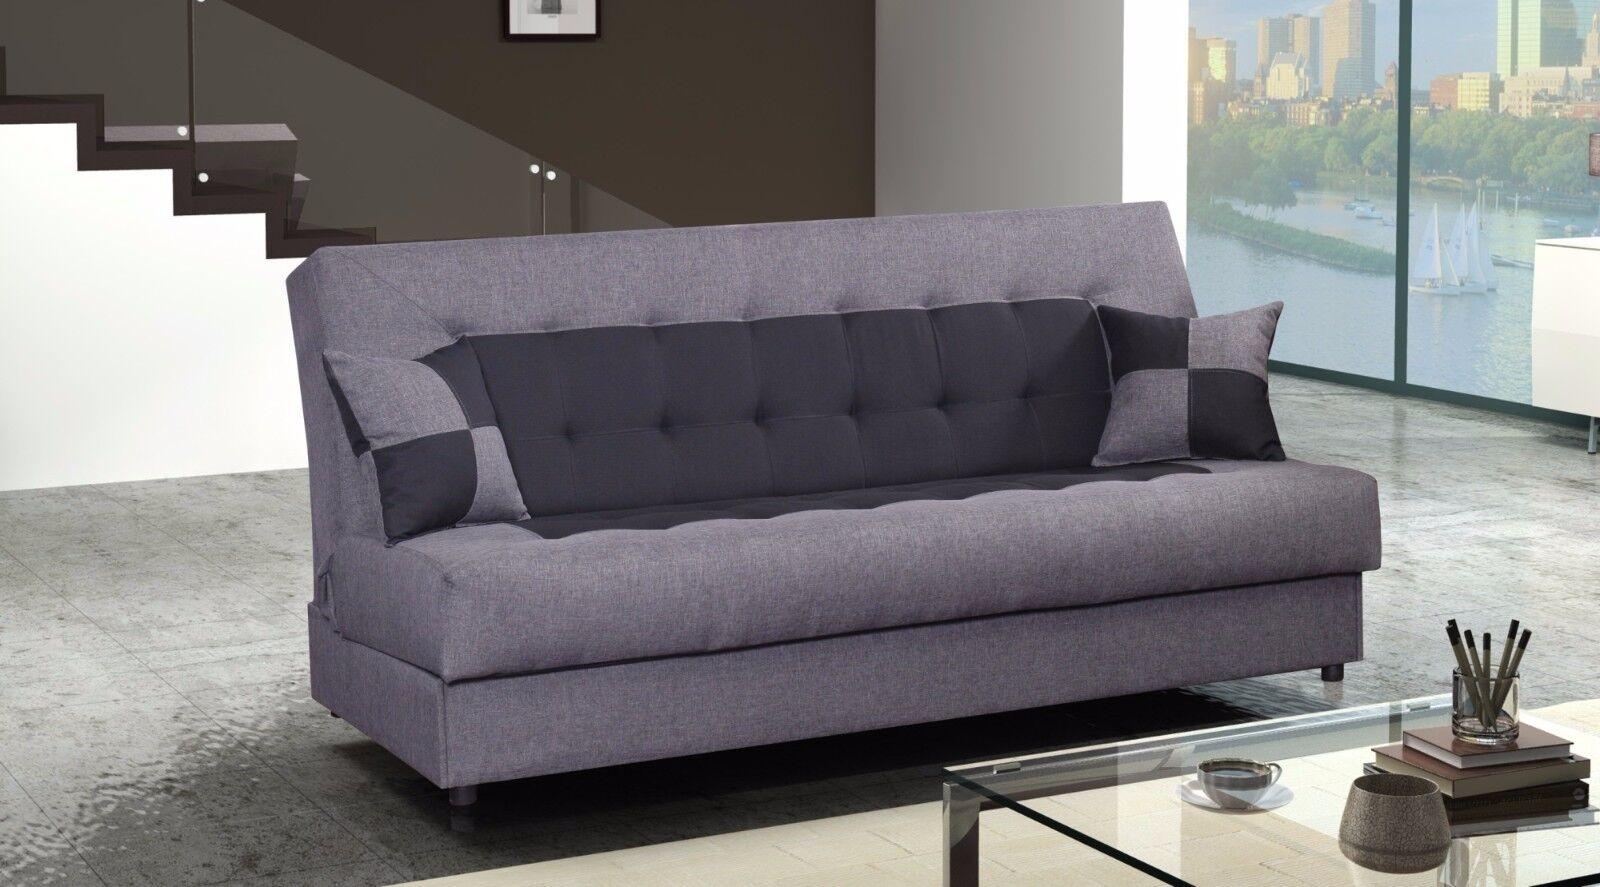 torino couch sofa 3sitzer mit kissen webstoff farbwahl schlaffunktion grau eur 209 00. Black Bedroom Furniture Sets. Home Design Ideas